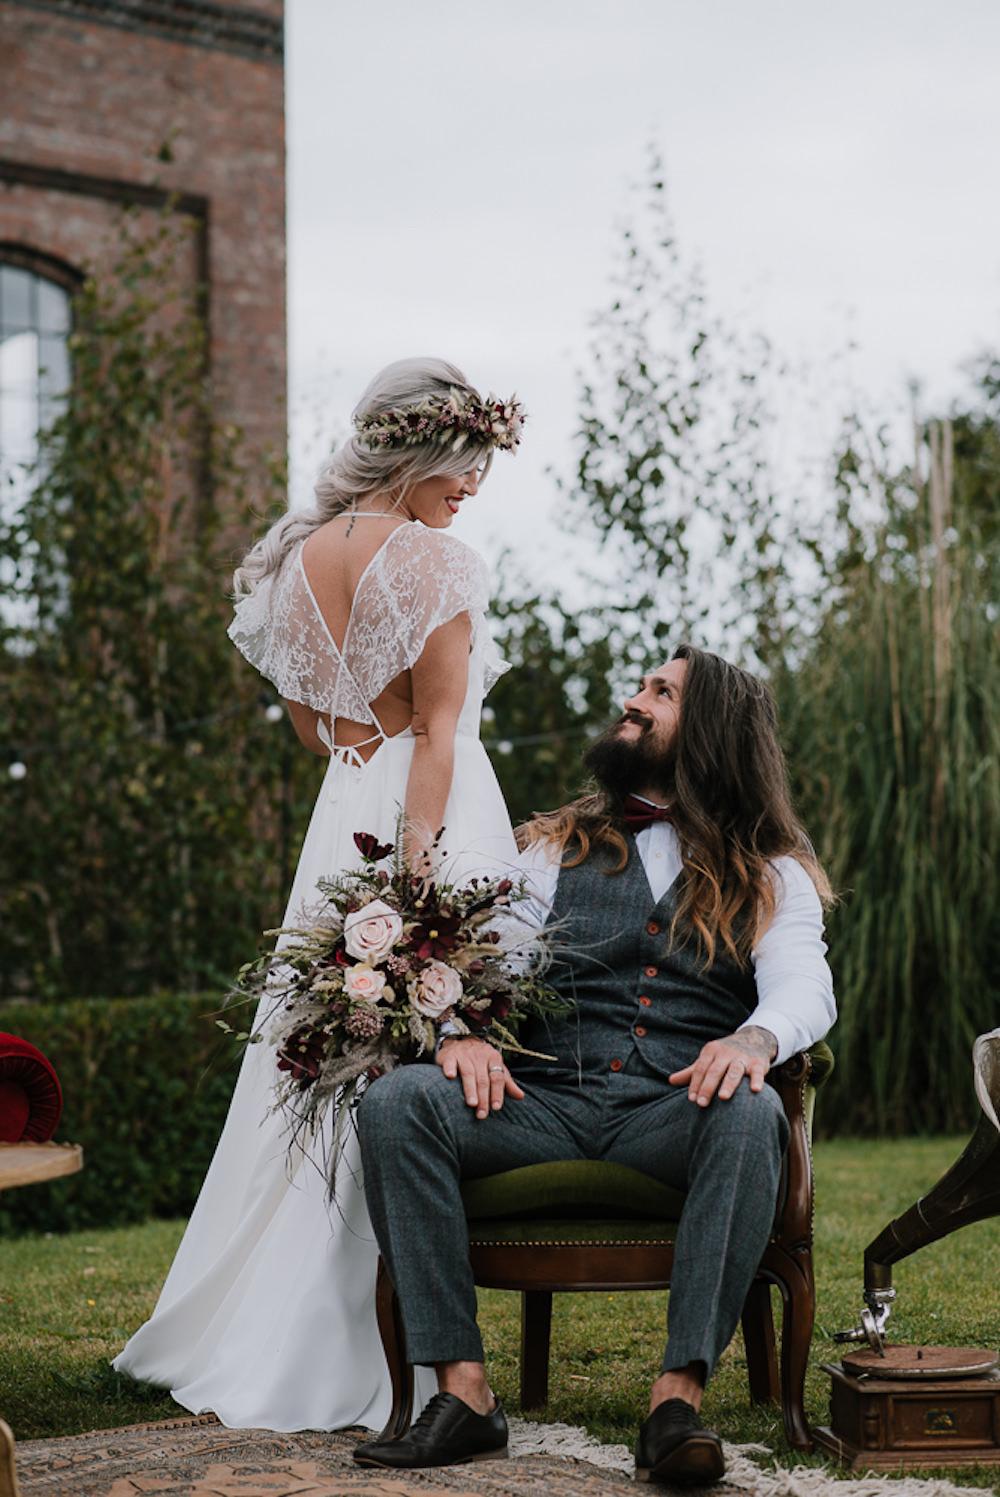 Bride Bridal Dress Gown Lace Back Lisa Lyons Unconventional Wedding Ideas Pierra G Photography